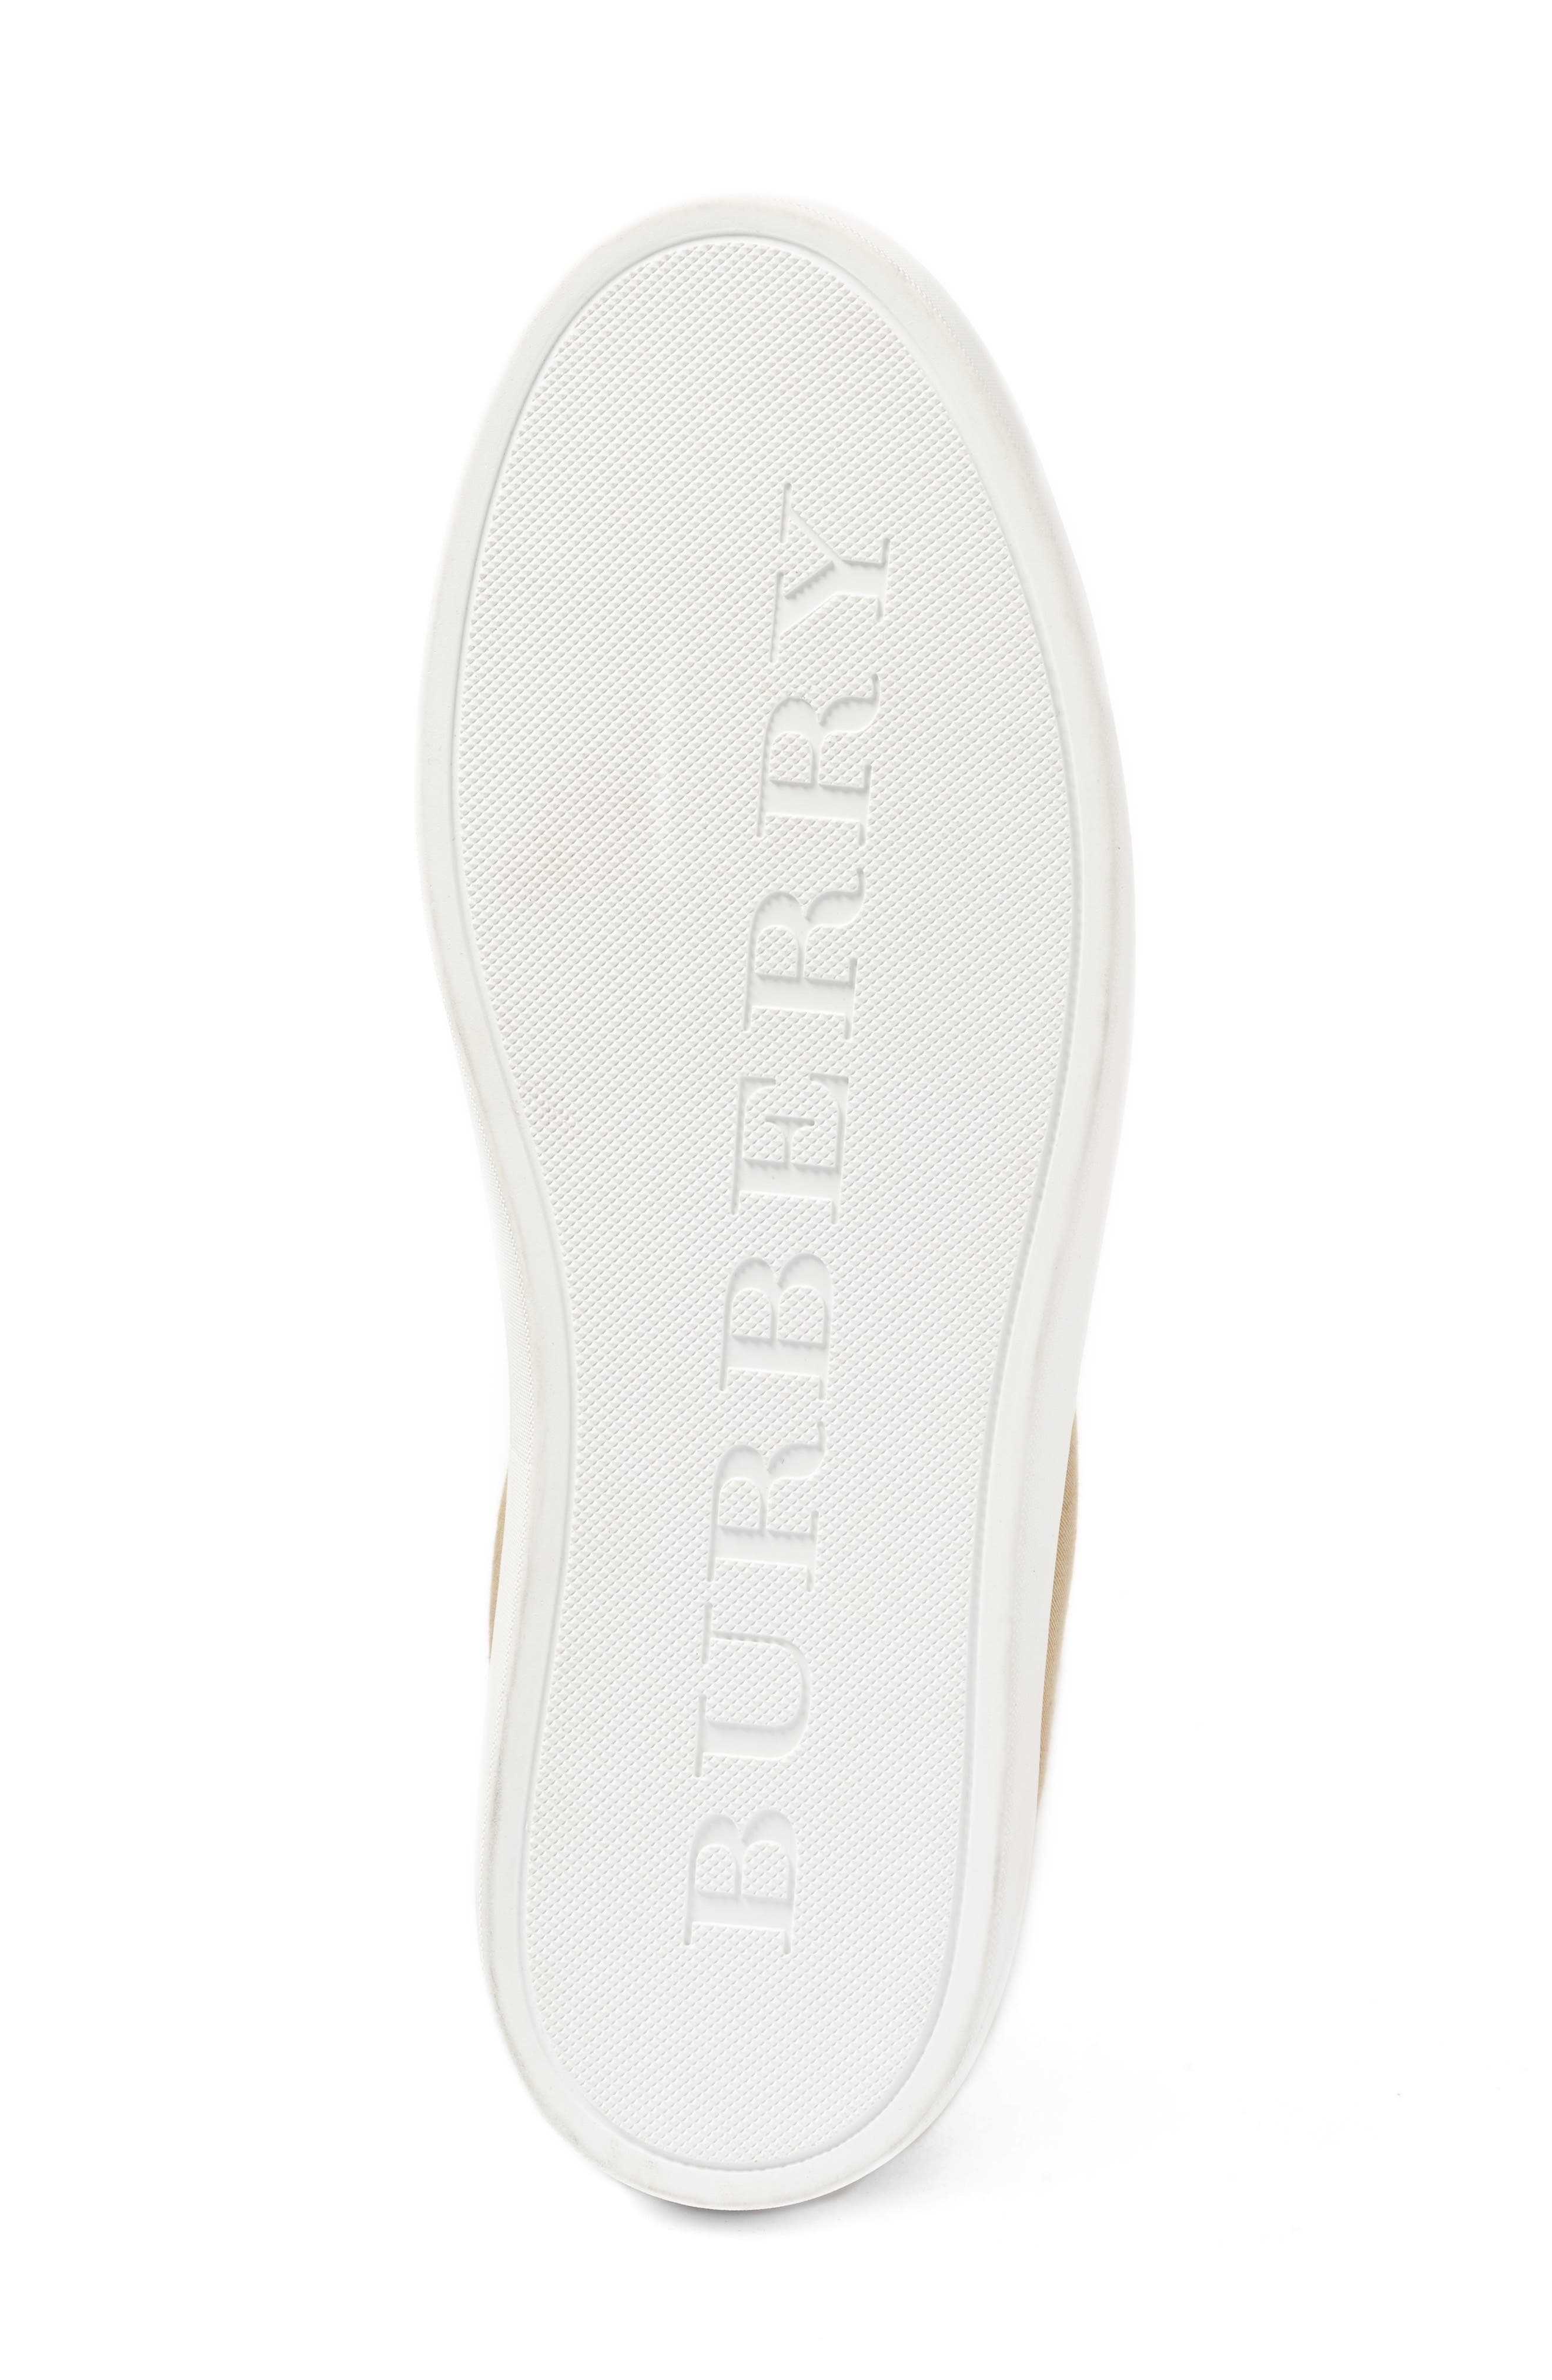 Westford Sneaker,                             Alternate thumbnail 4, color,                             200